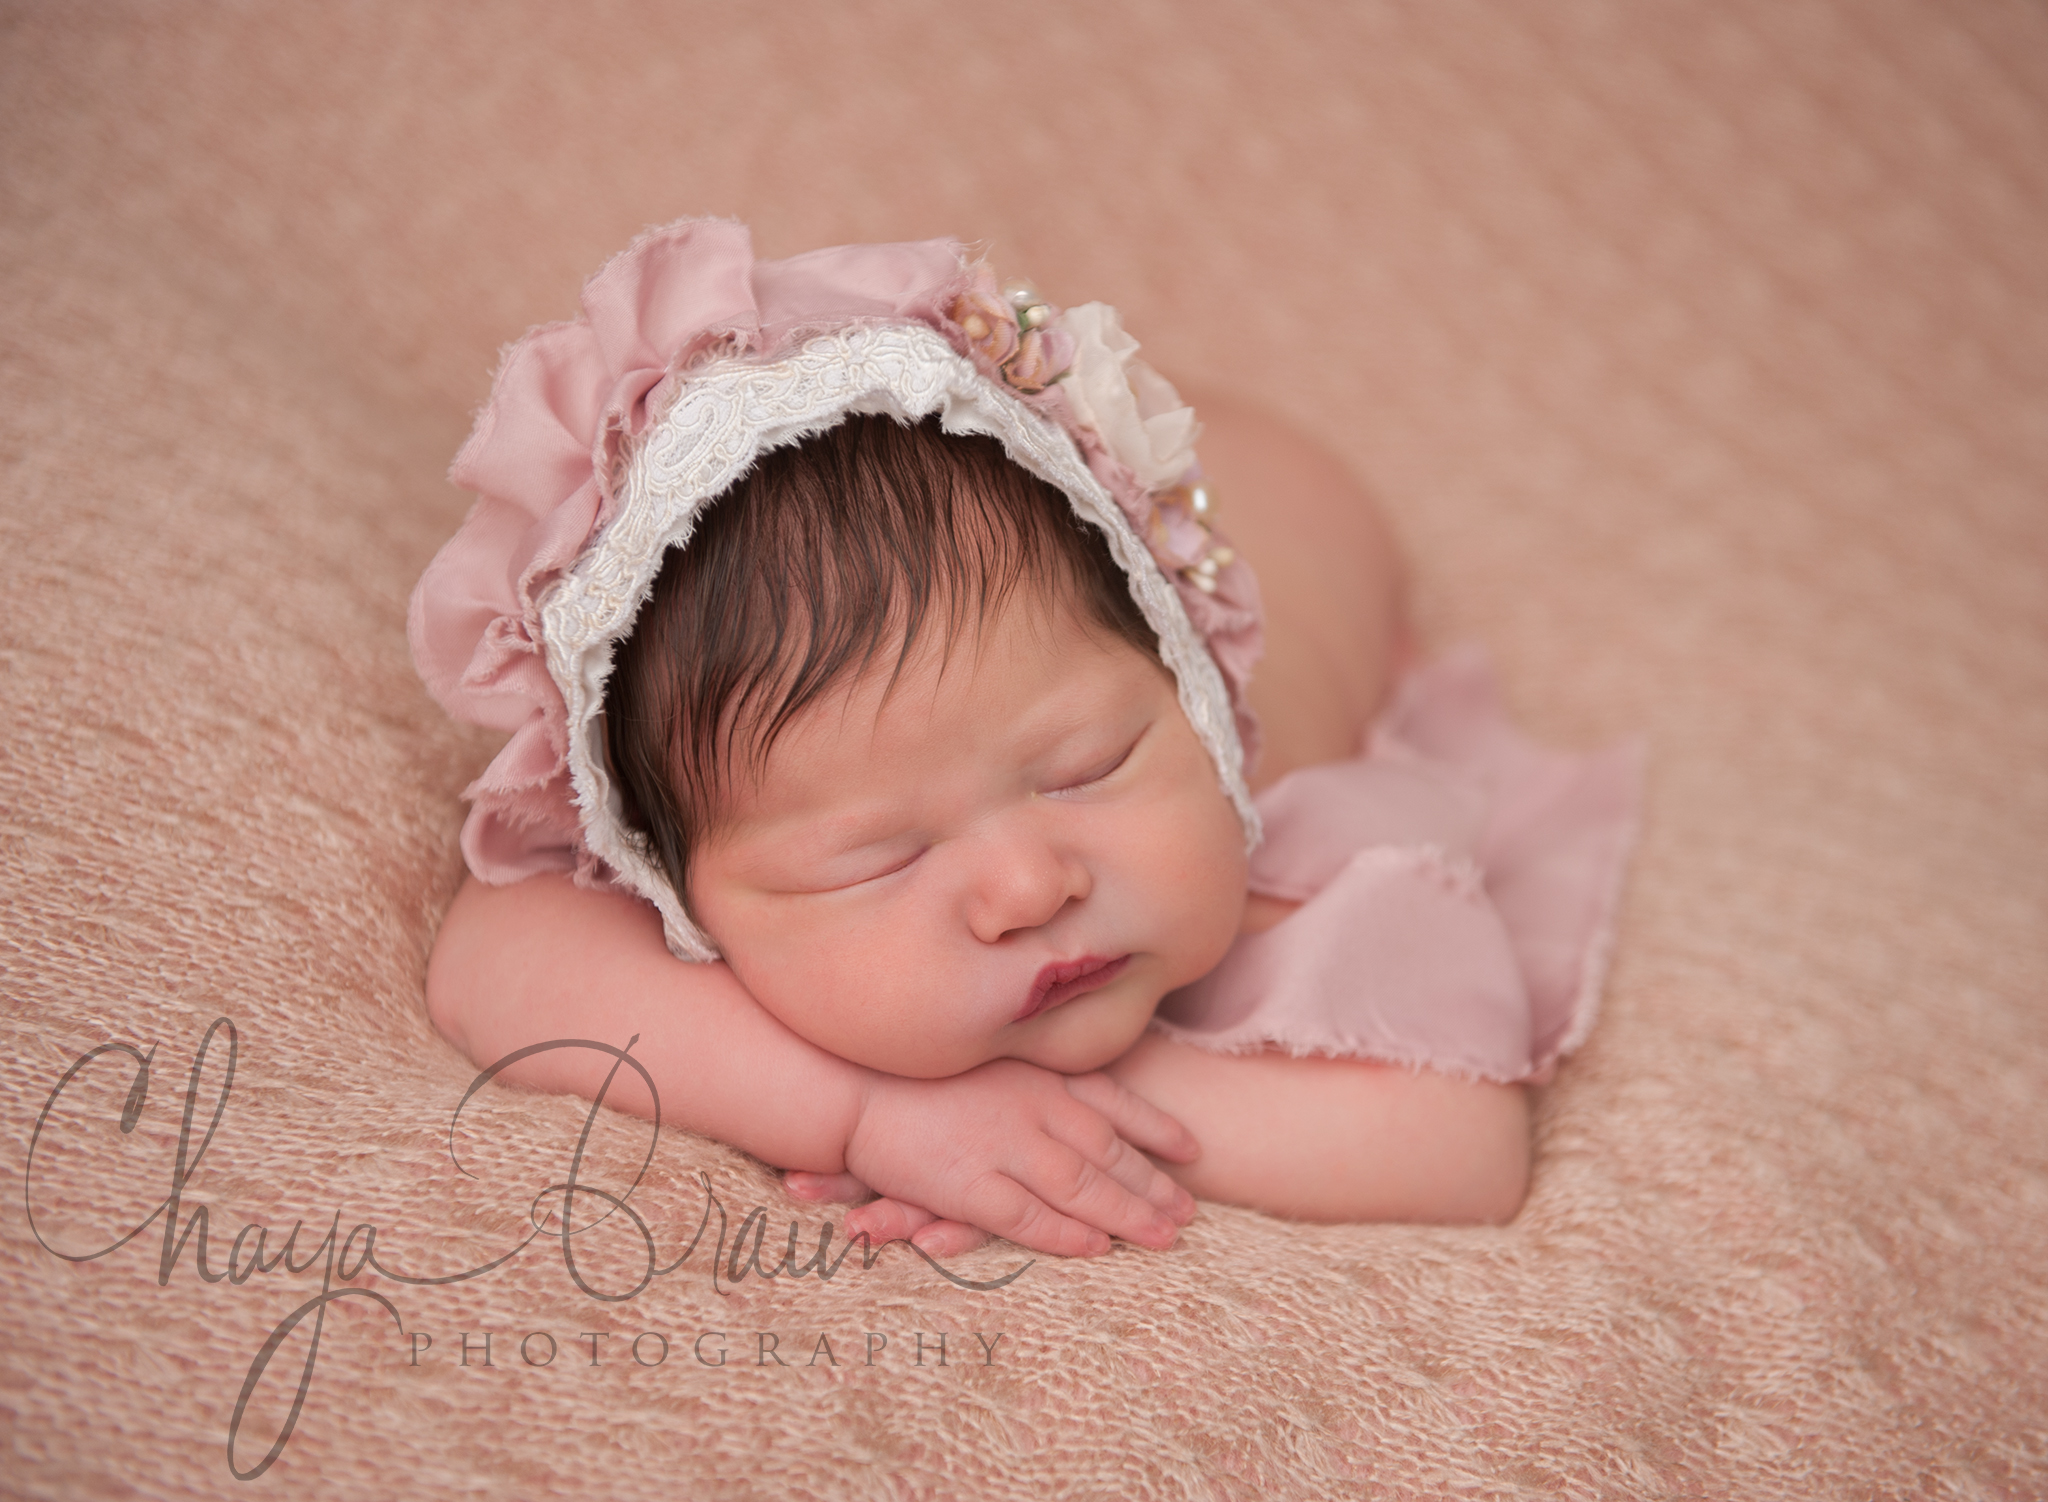 Sleeping newborn baby girl in pretty bonnet